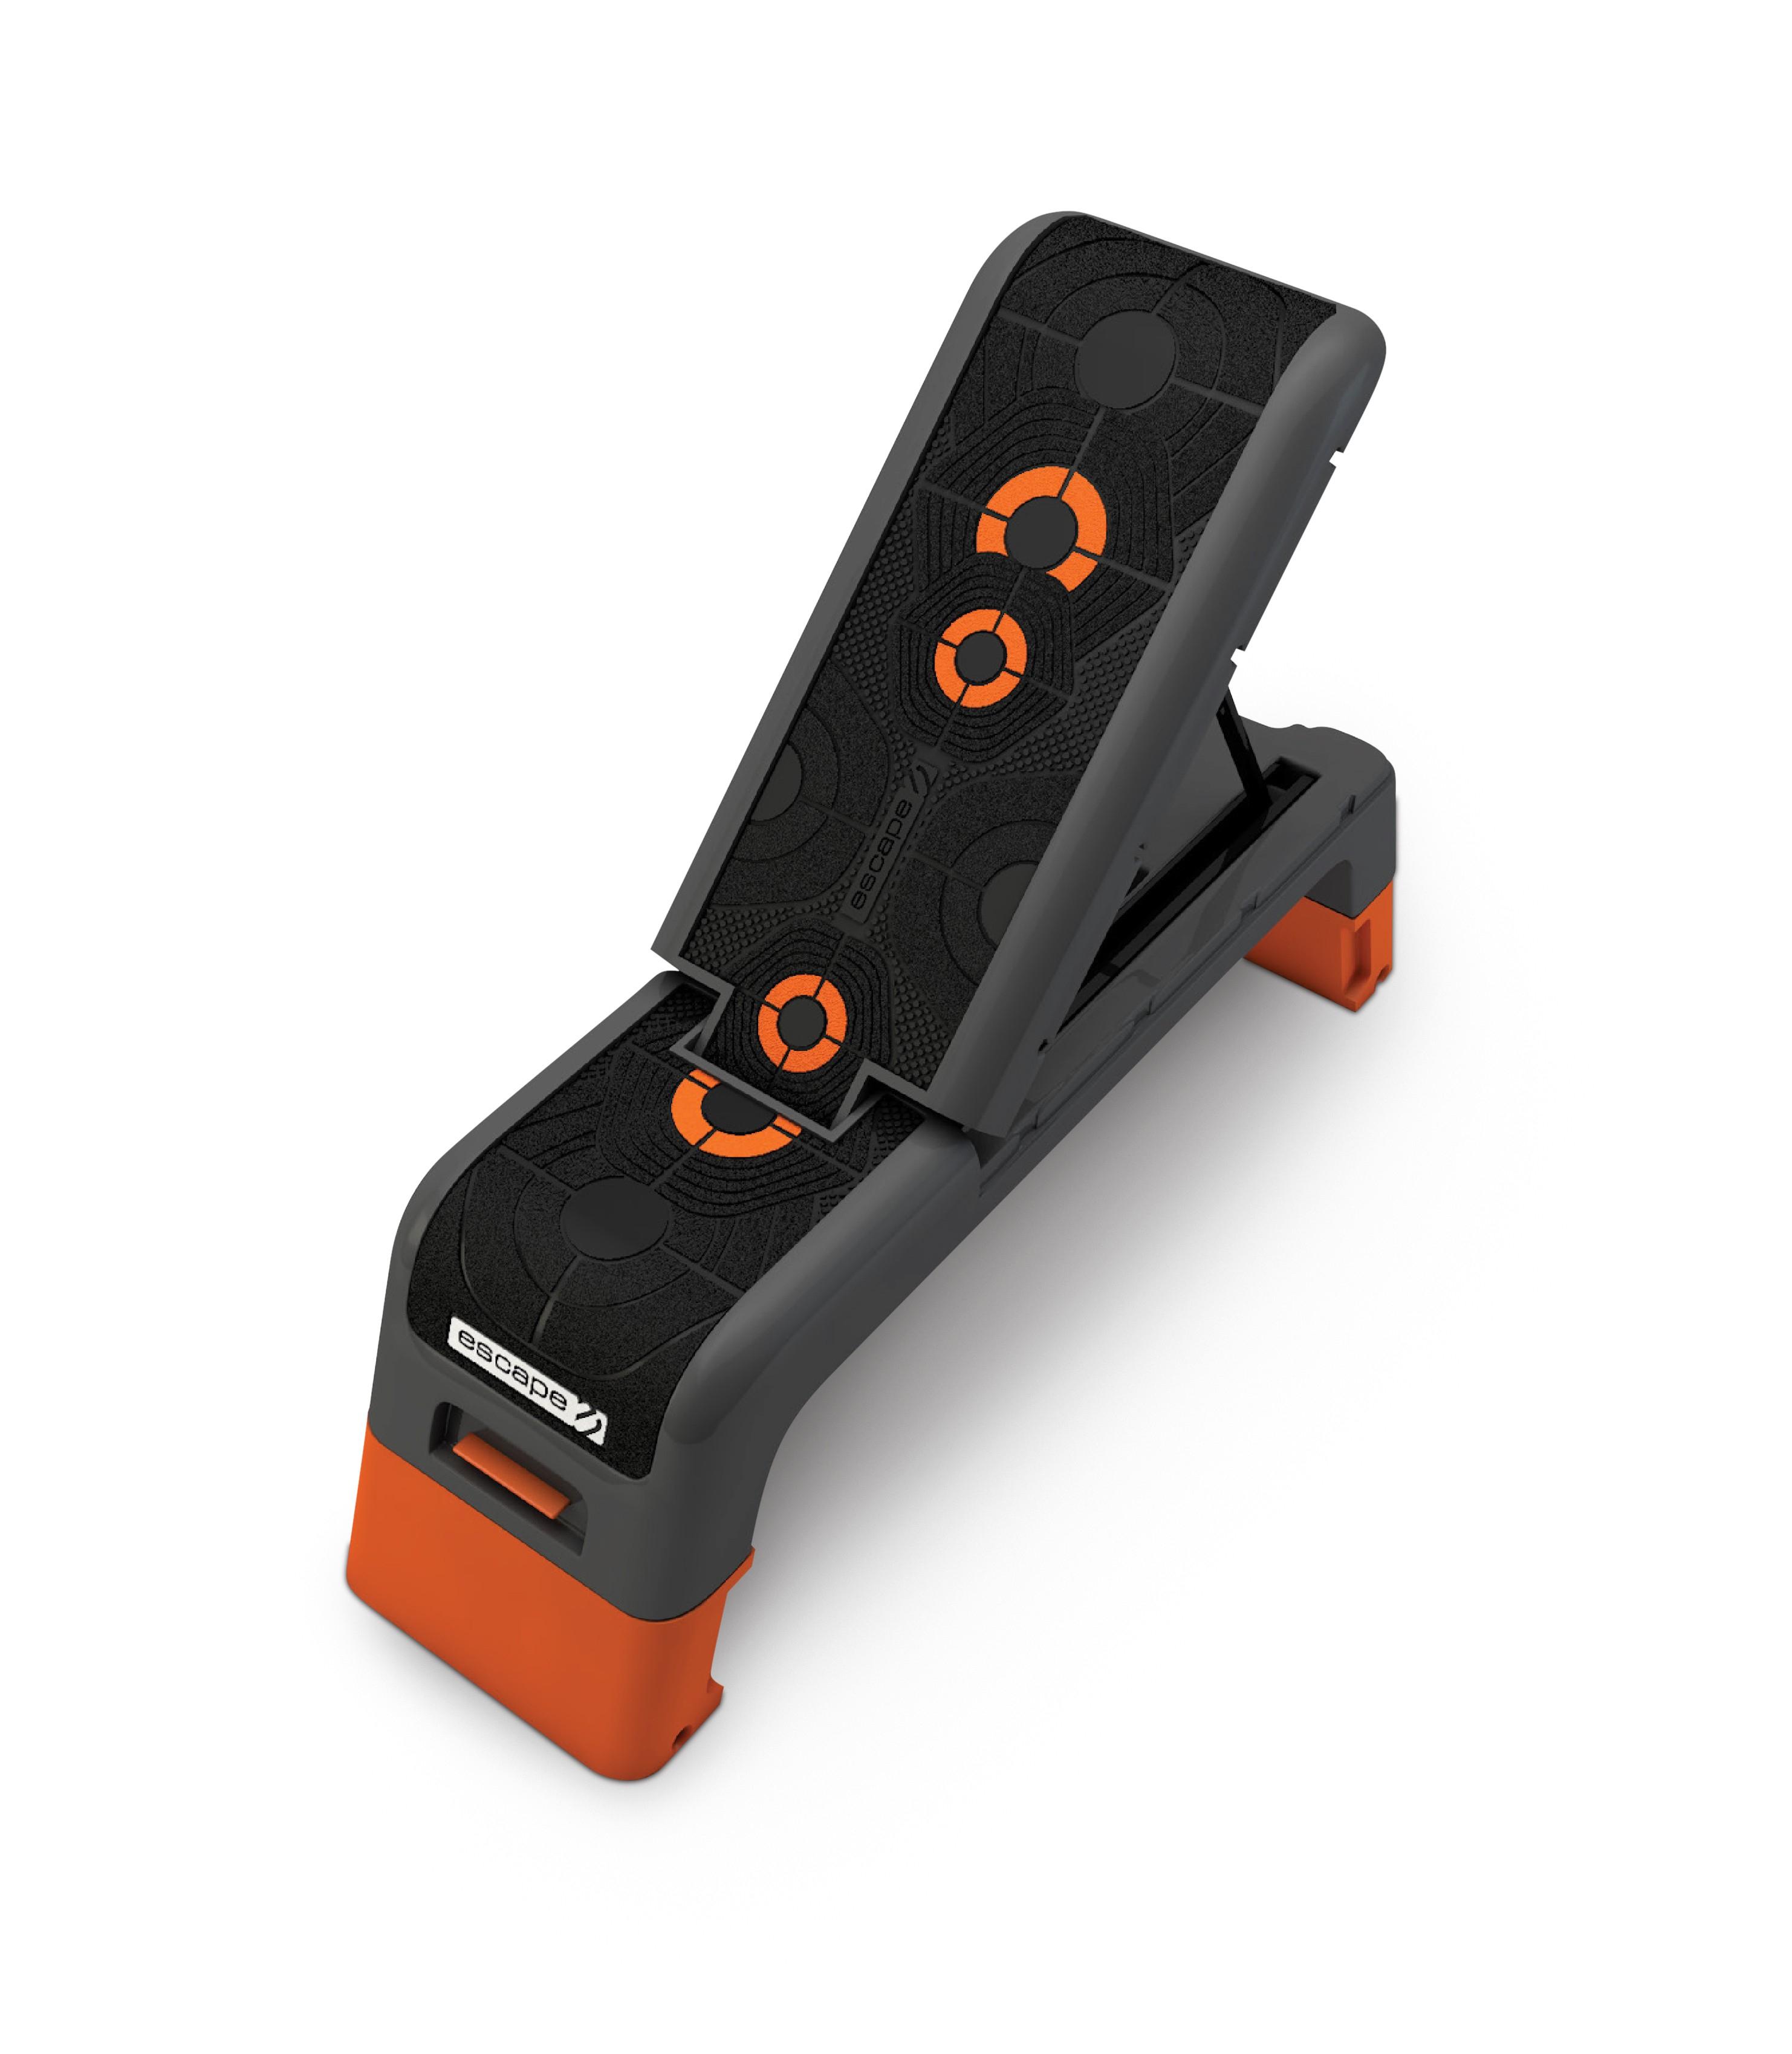 Escape Fitness Deck 2 In 1 Step Bench Combo regarding measurements 2964 X 3397